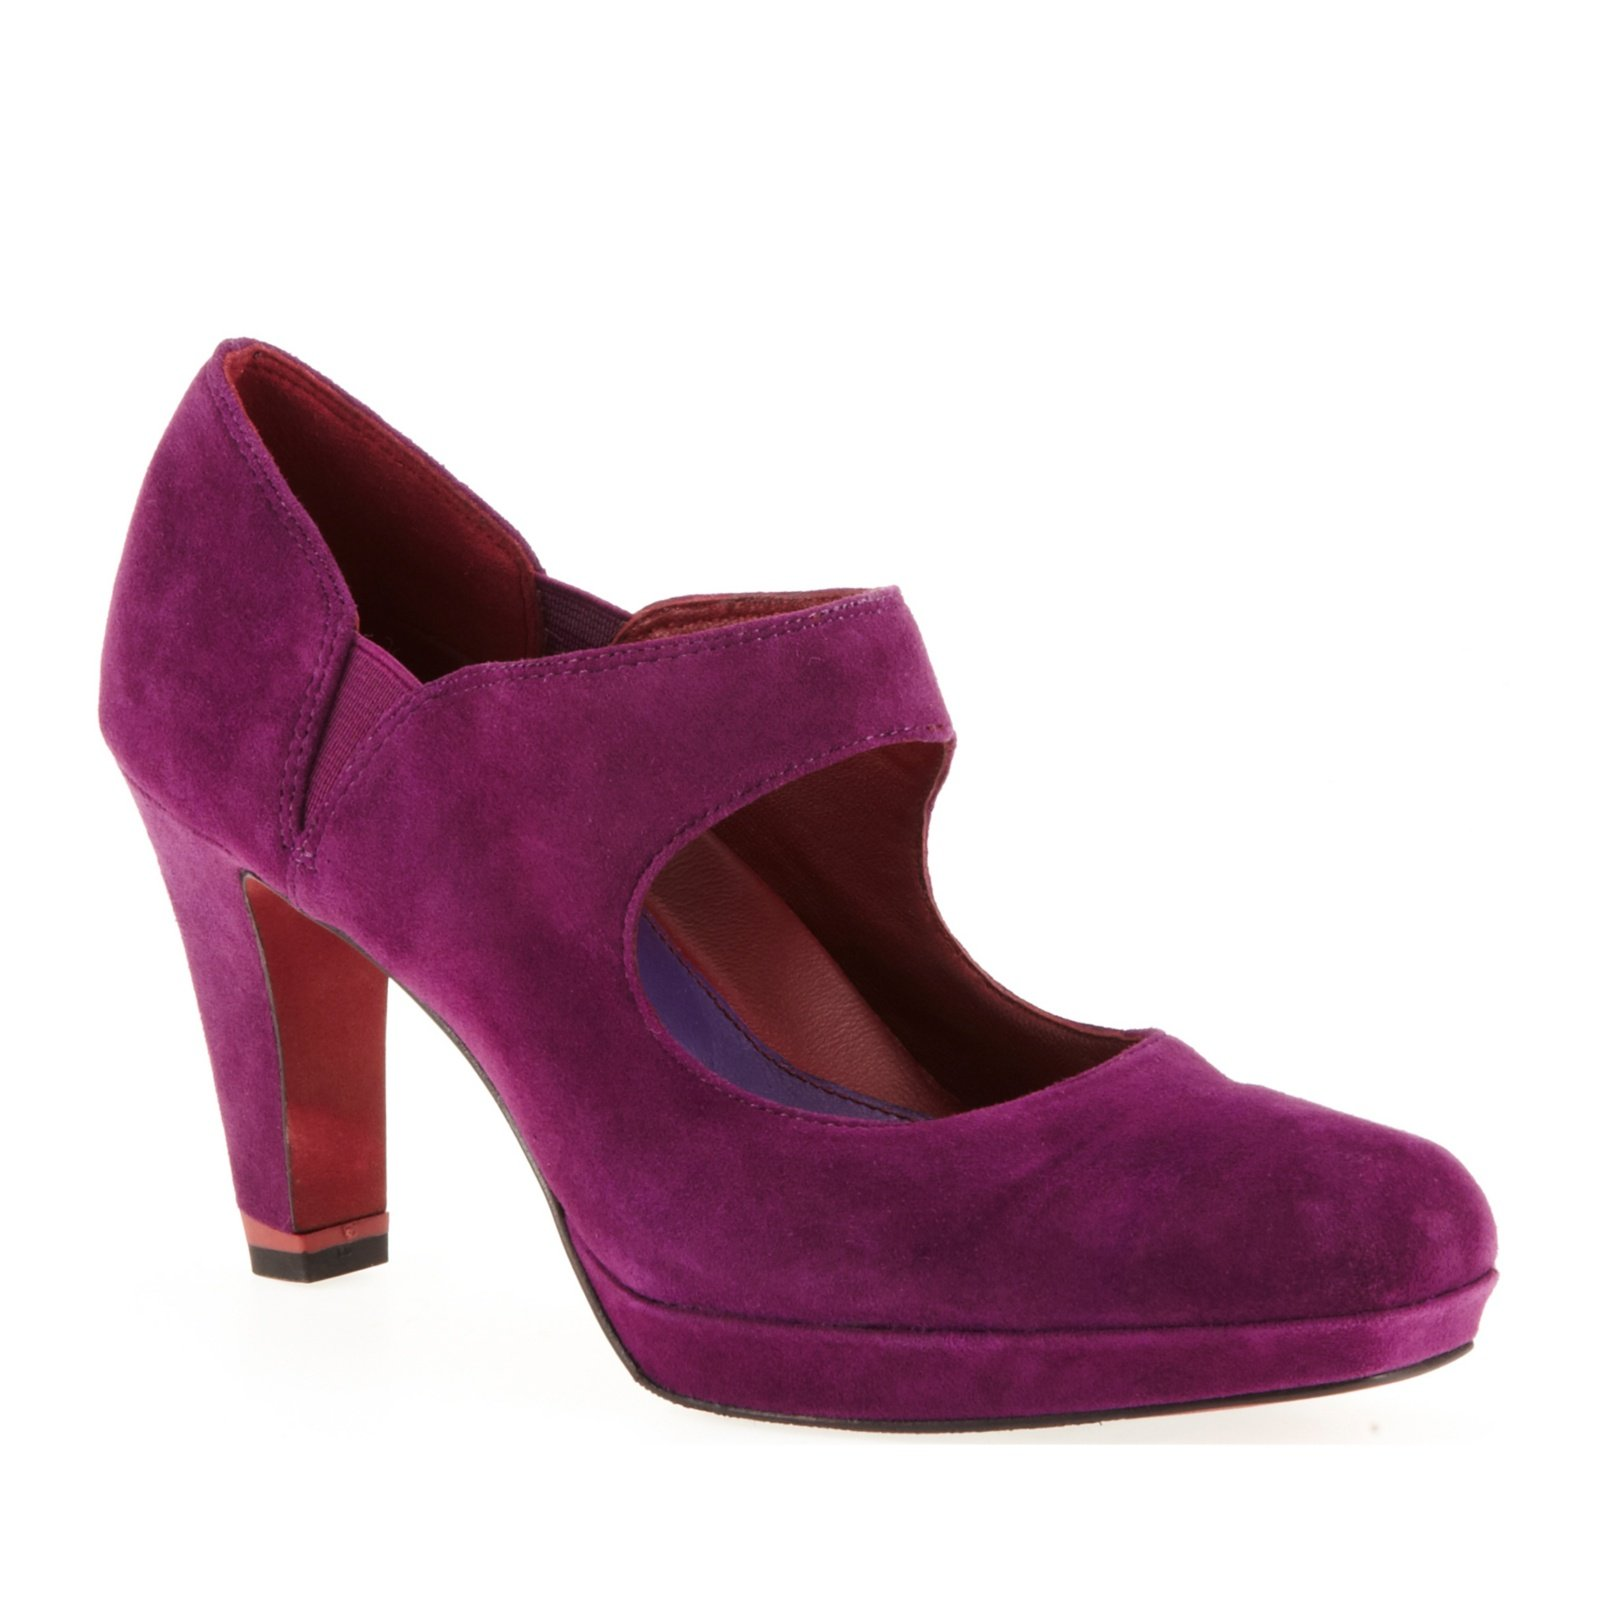 Oh! Shoes Women's Tori Mary Jane Pump,Deep Purple Suede,36 EU / 5 B(M) US